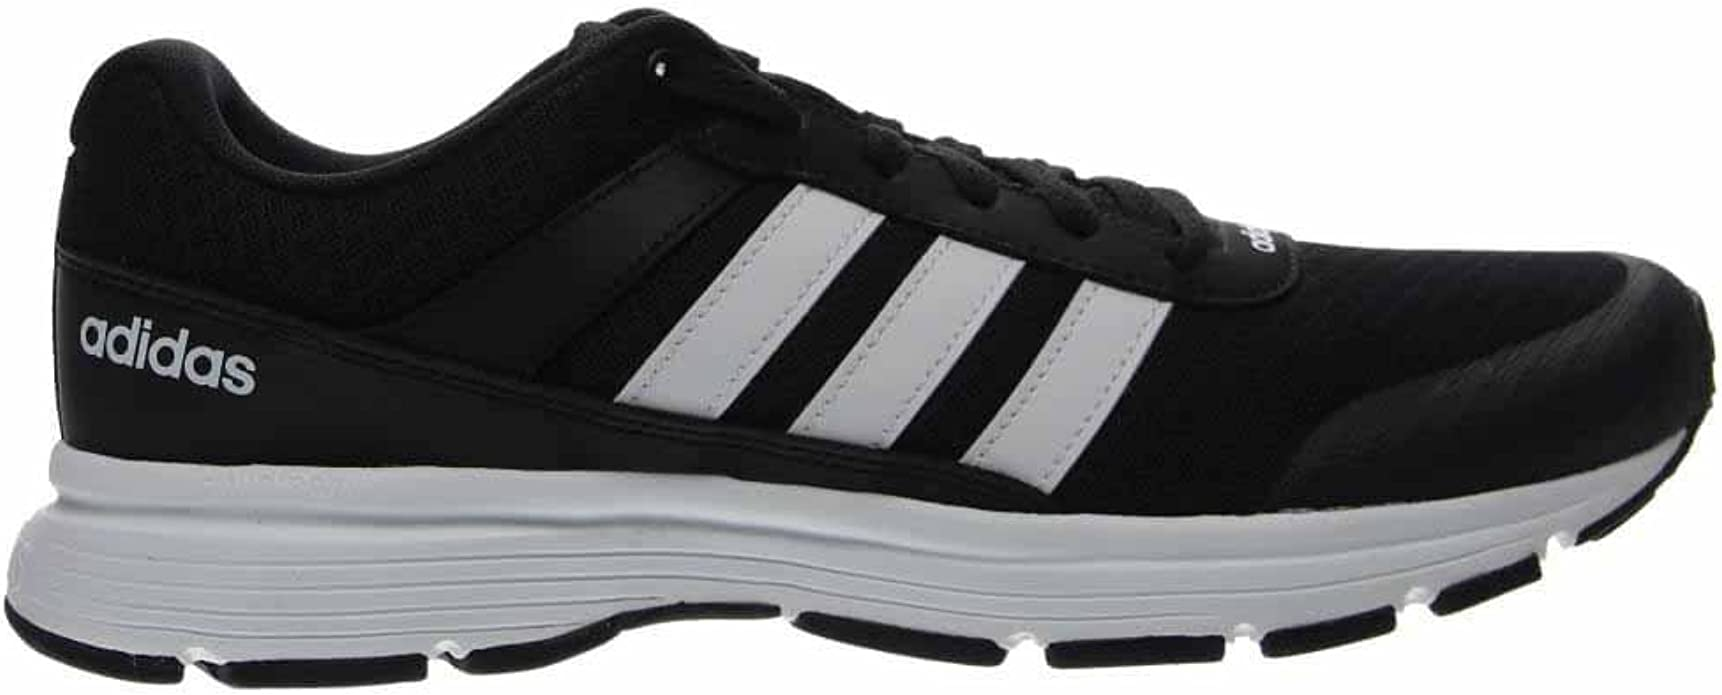 adidas Performance Men's Cloudfoam Vs City Running Shoe